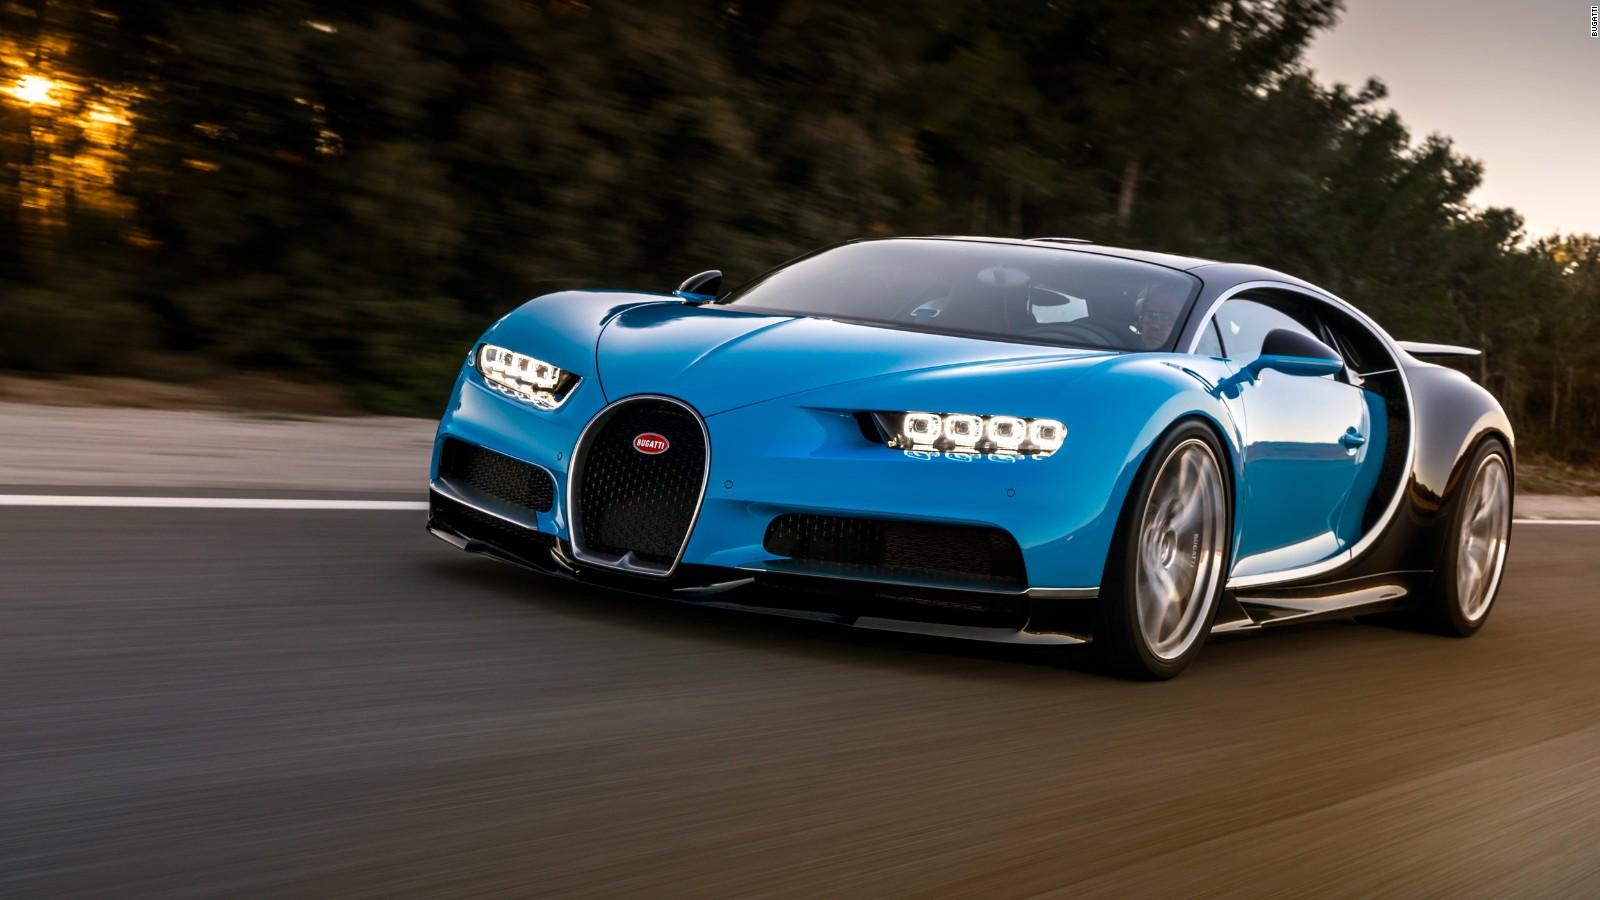 meet the worlds next fastest car bugatti chiron cnn video - Bugatti 2016 Gold